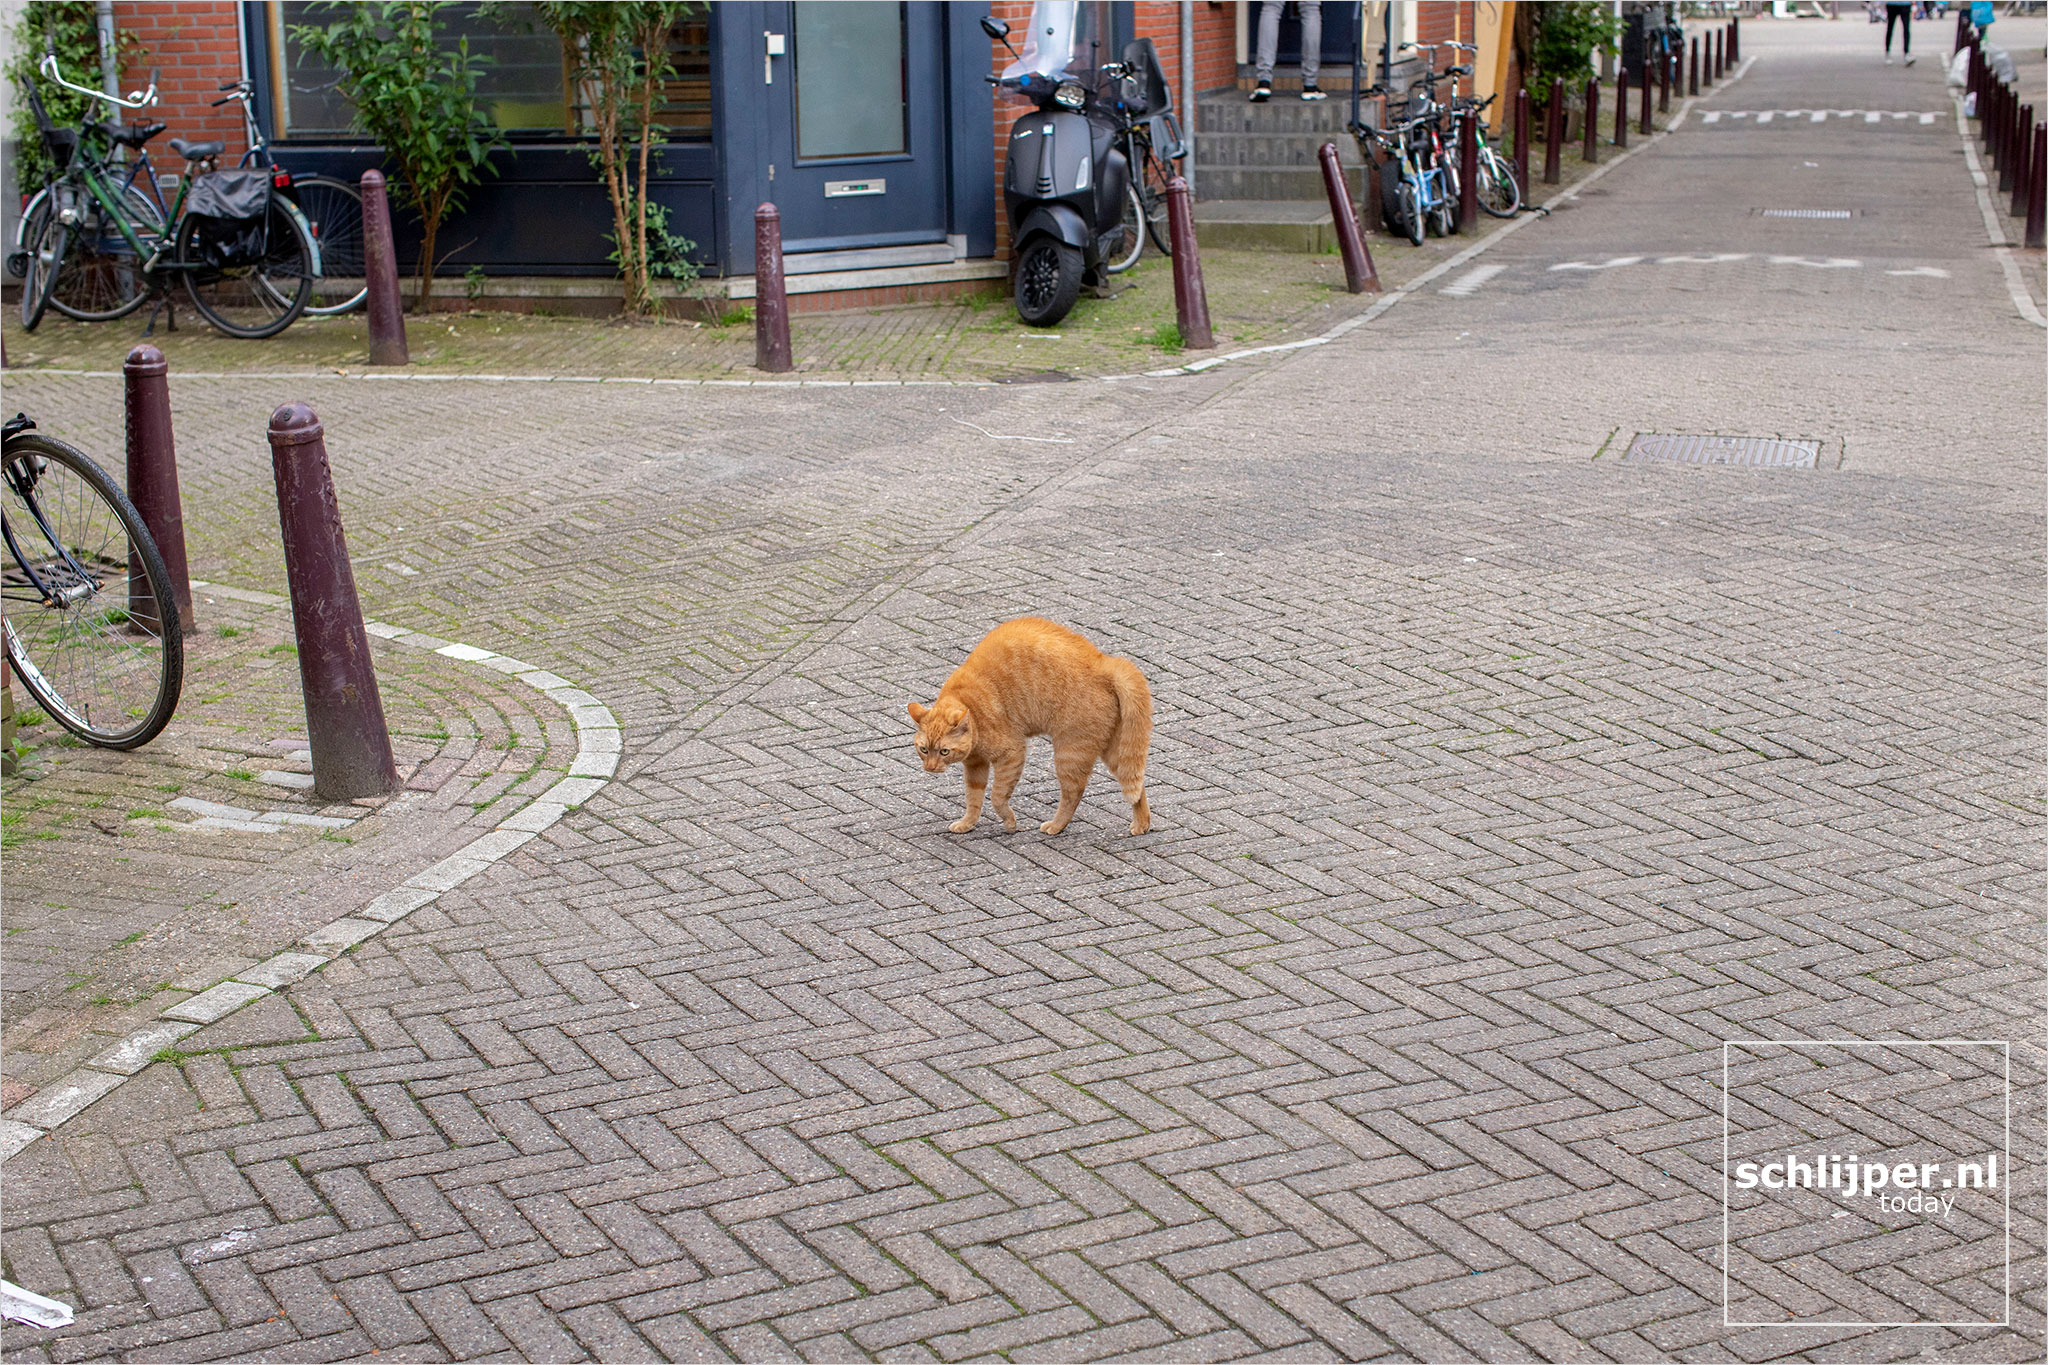 The Netherlands, Amsterdam, 17 mei 2021